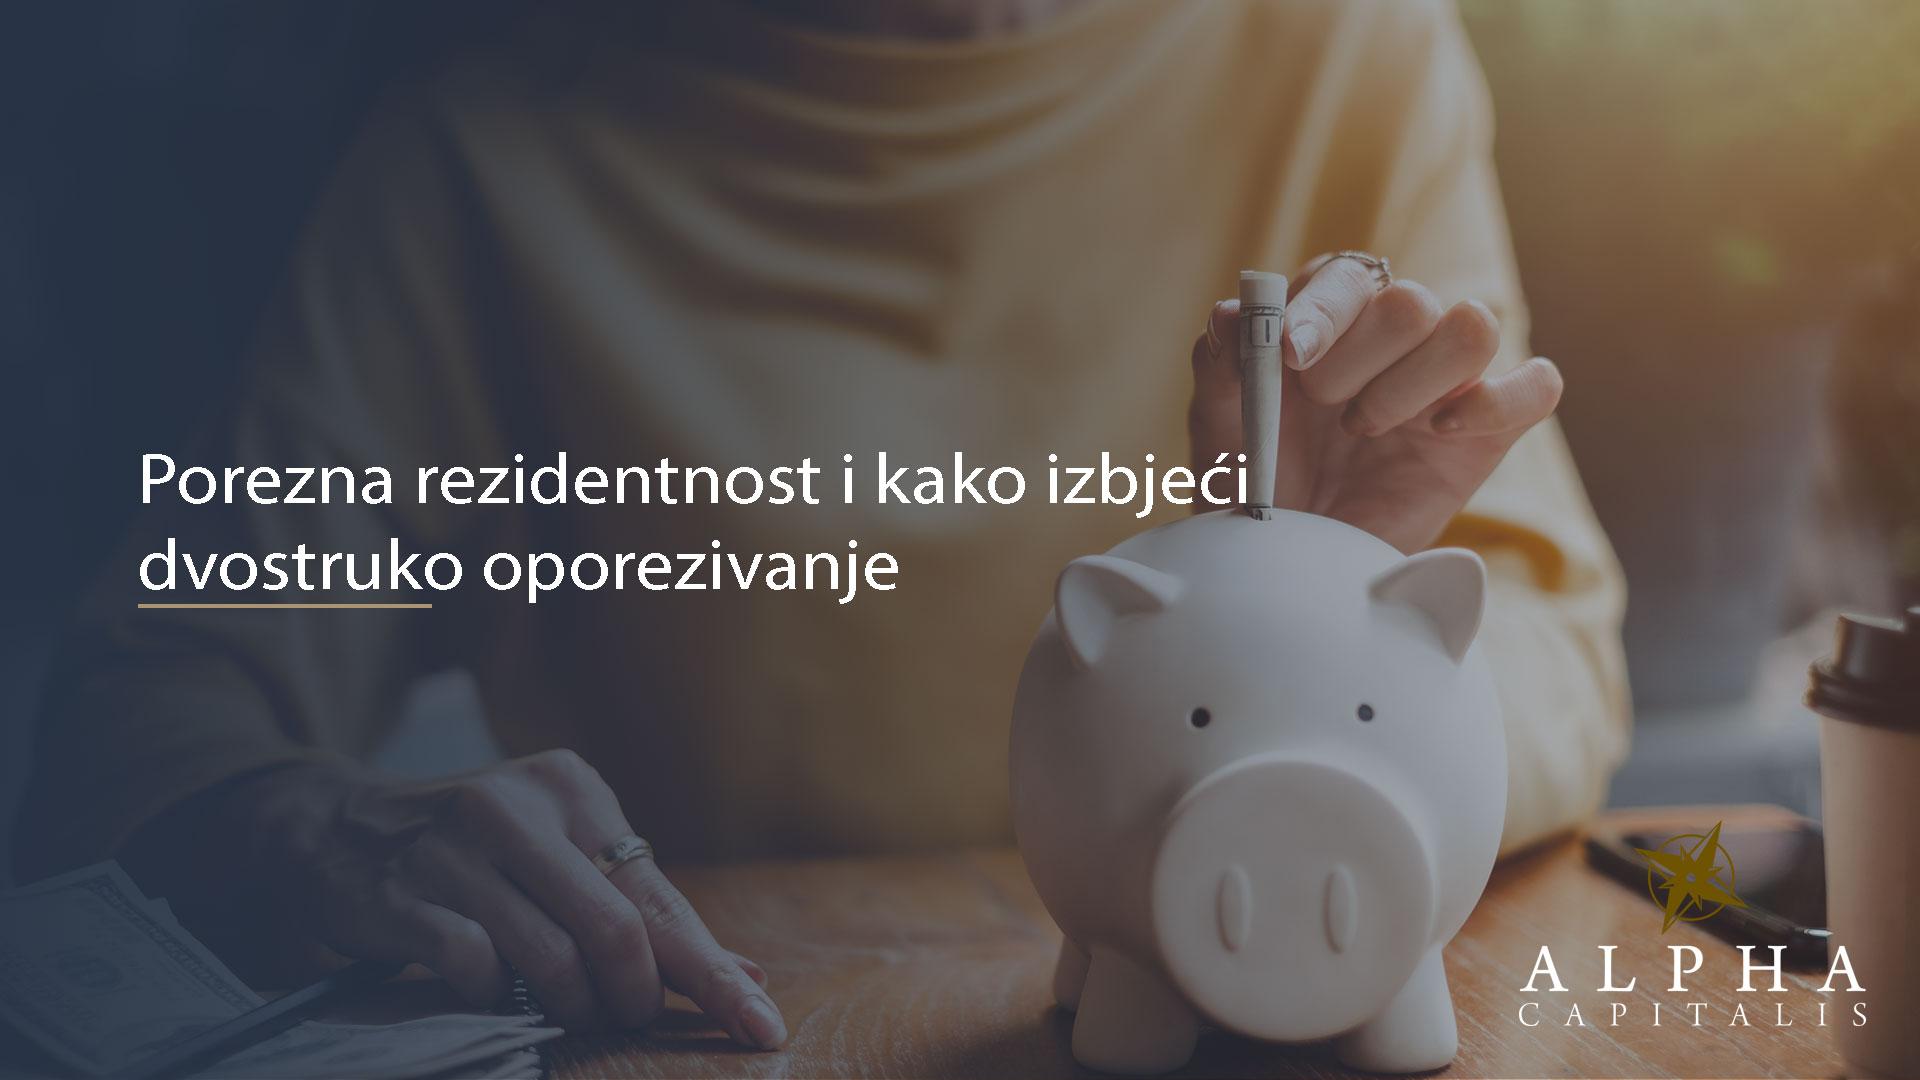 Alpha-capitalis-blog-porezna-rezidentnost